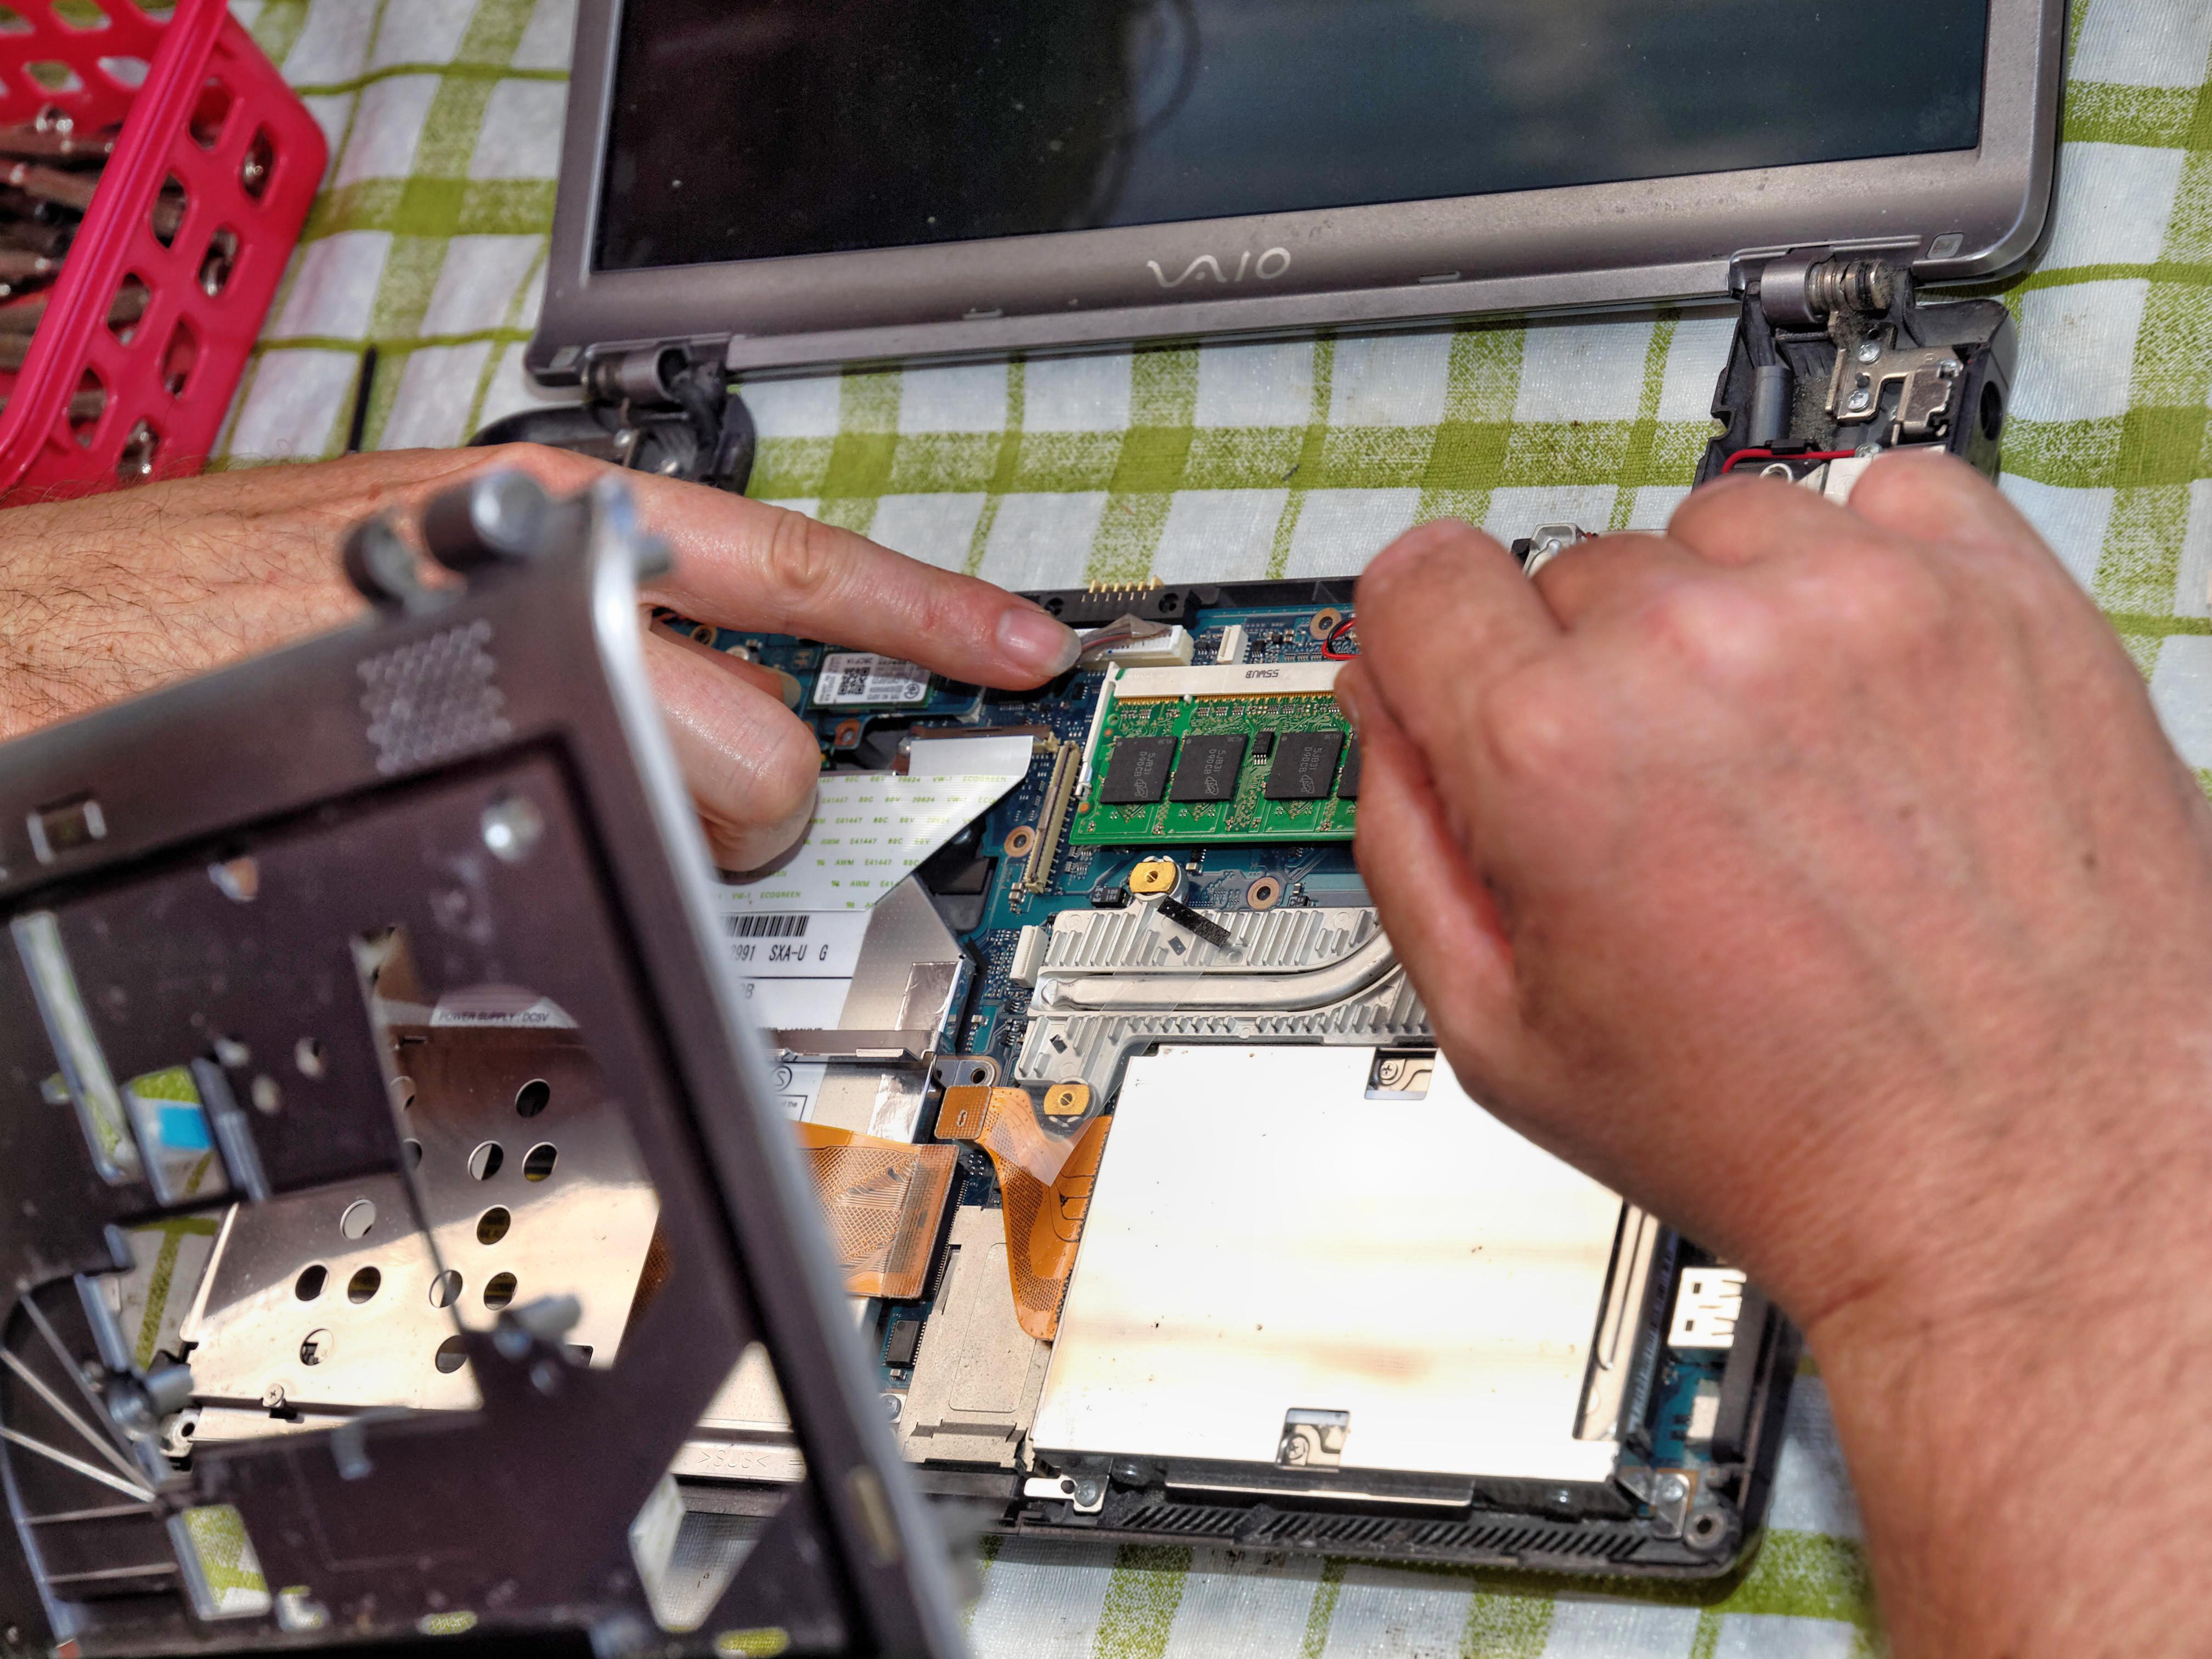 Juha-destroying-Edwins-laptop-9.jpeg